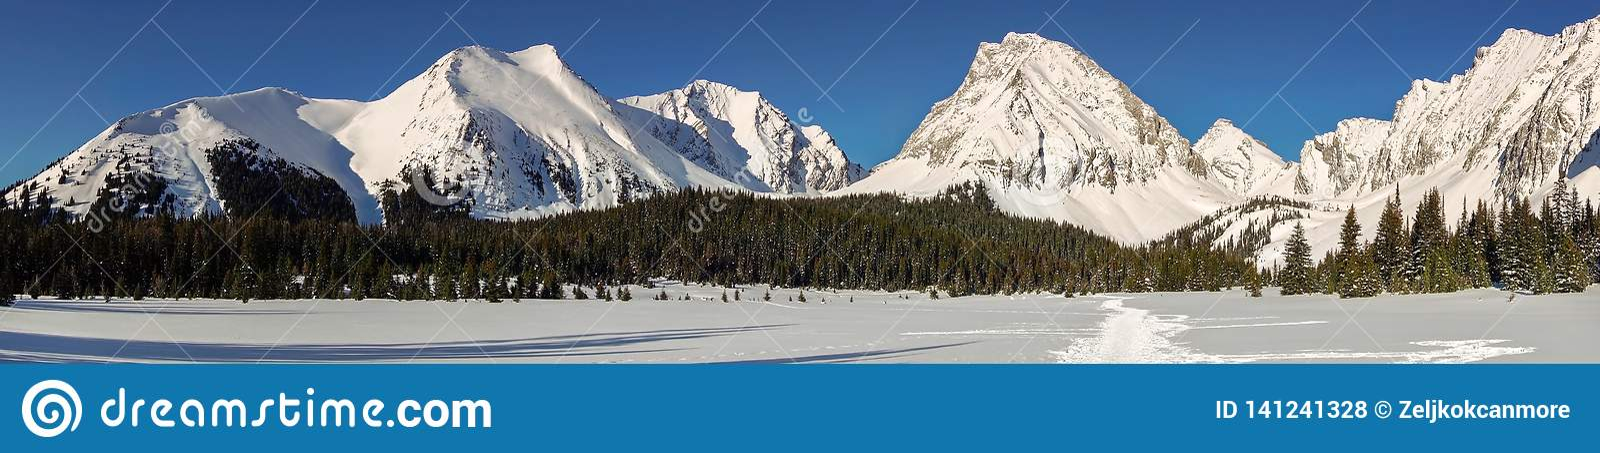 Snowy Mountain Peaks Panoramic Landscape Cold Winter Kananaskis Alberta Canada